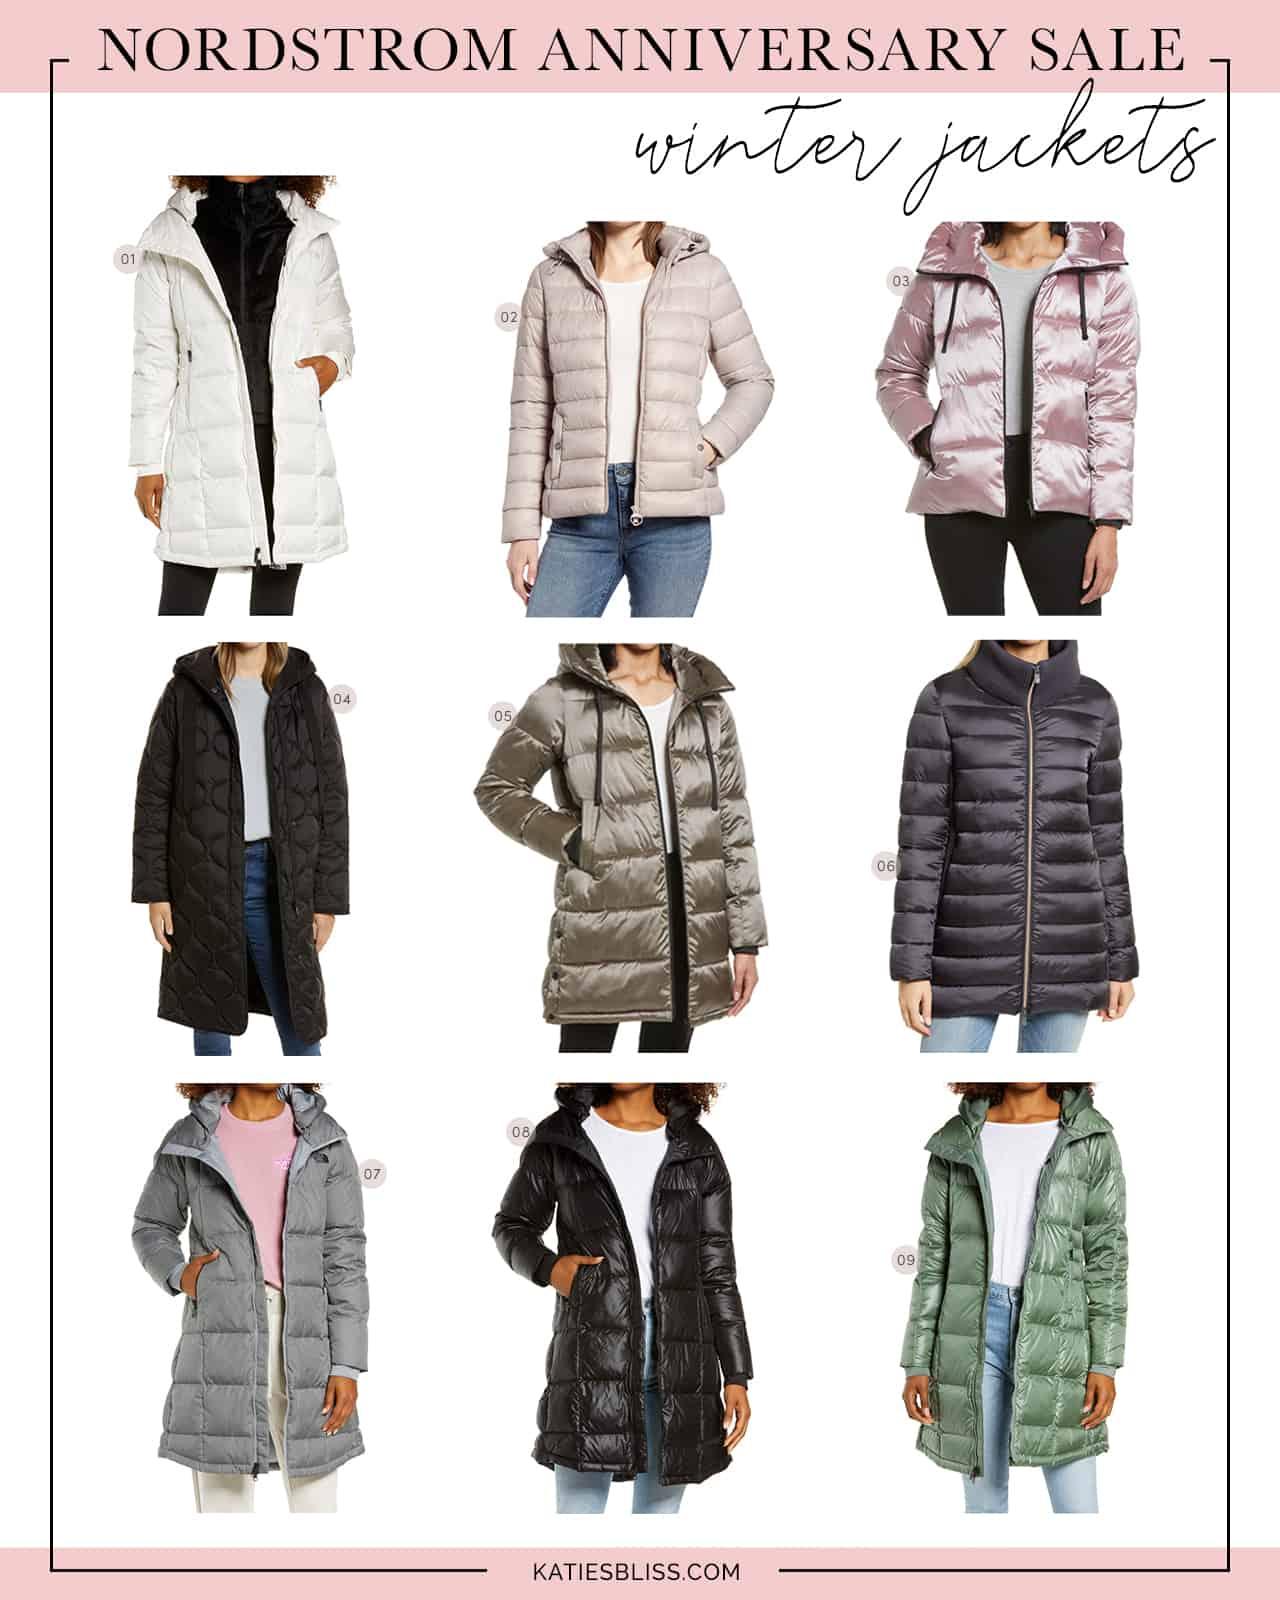 nordstrom anniversary sale winter jackets